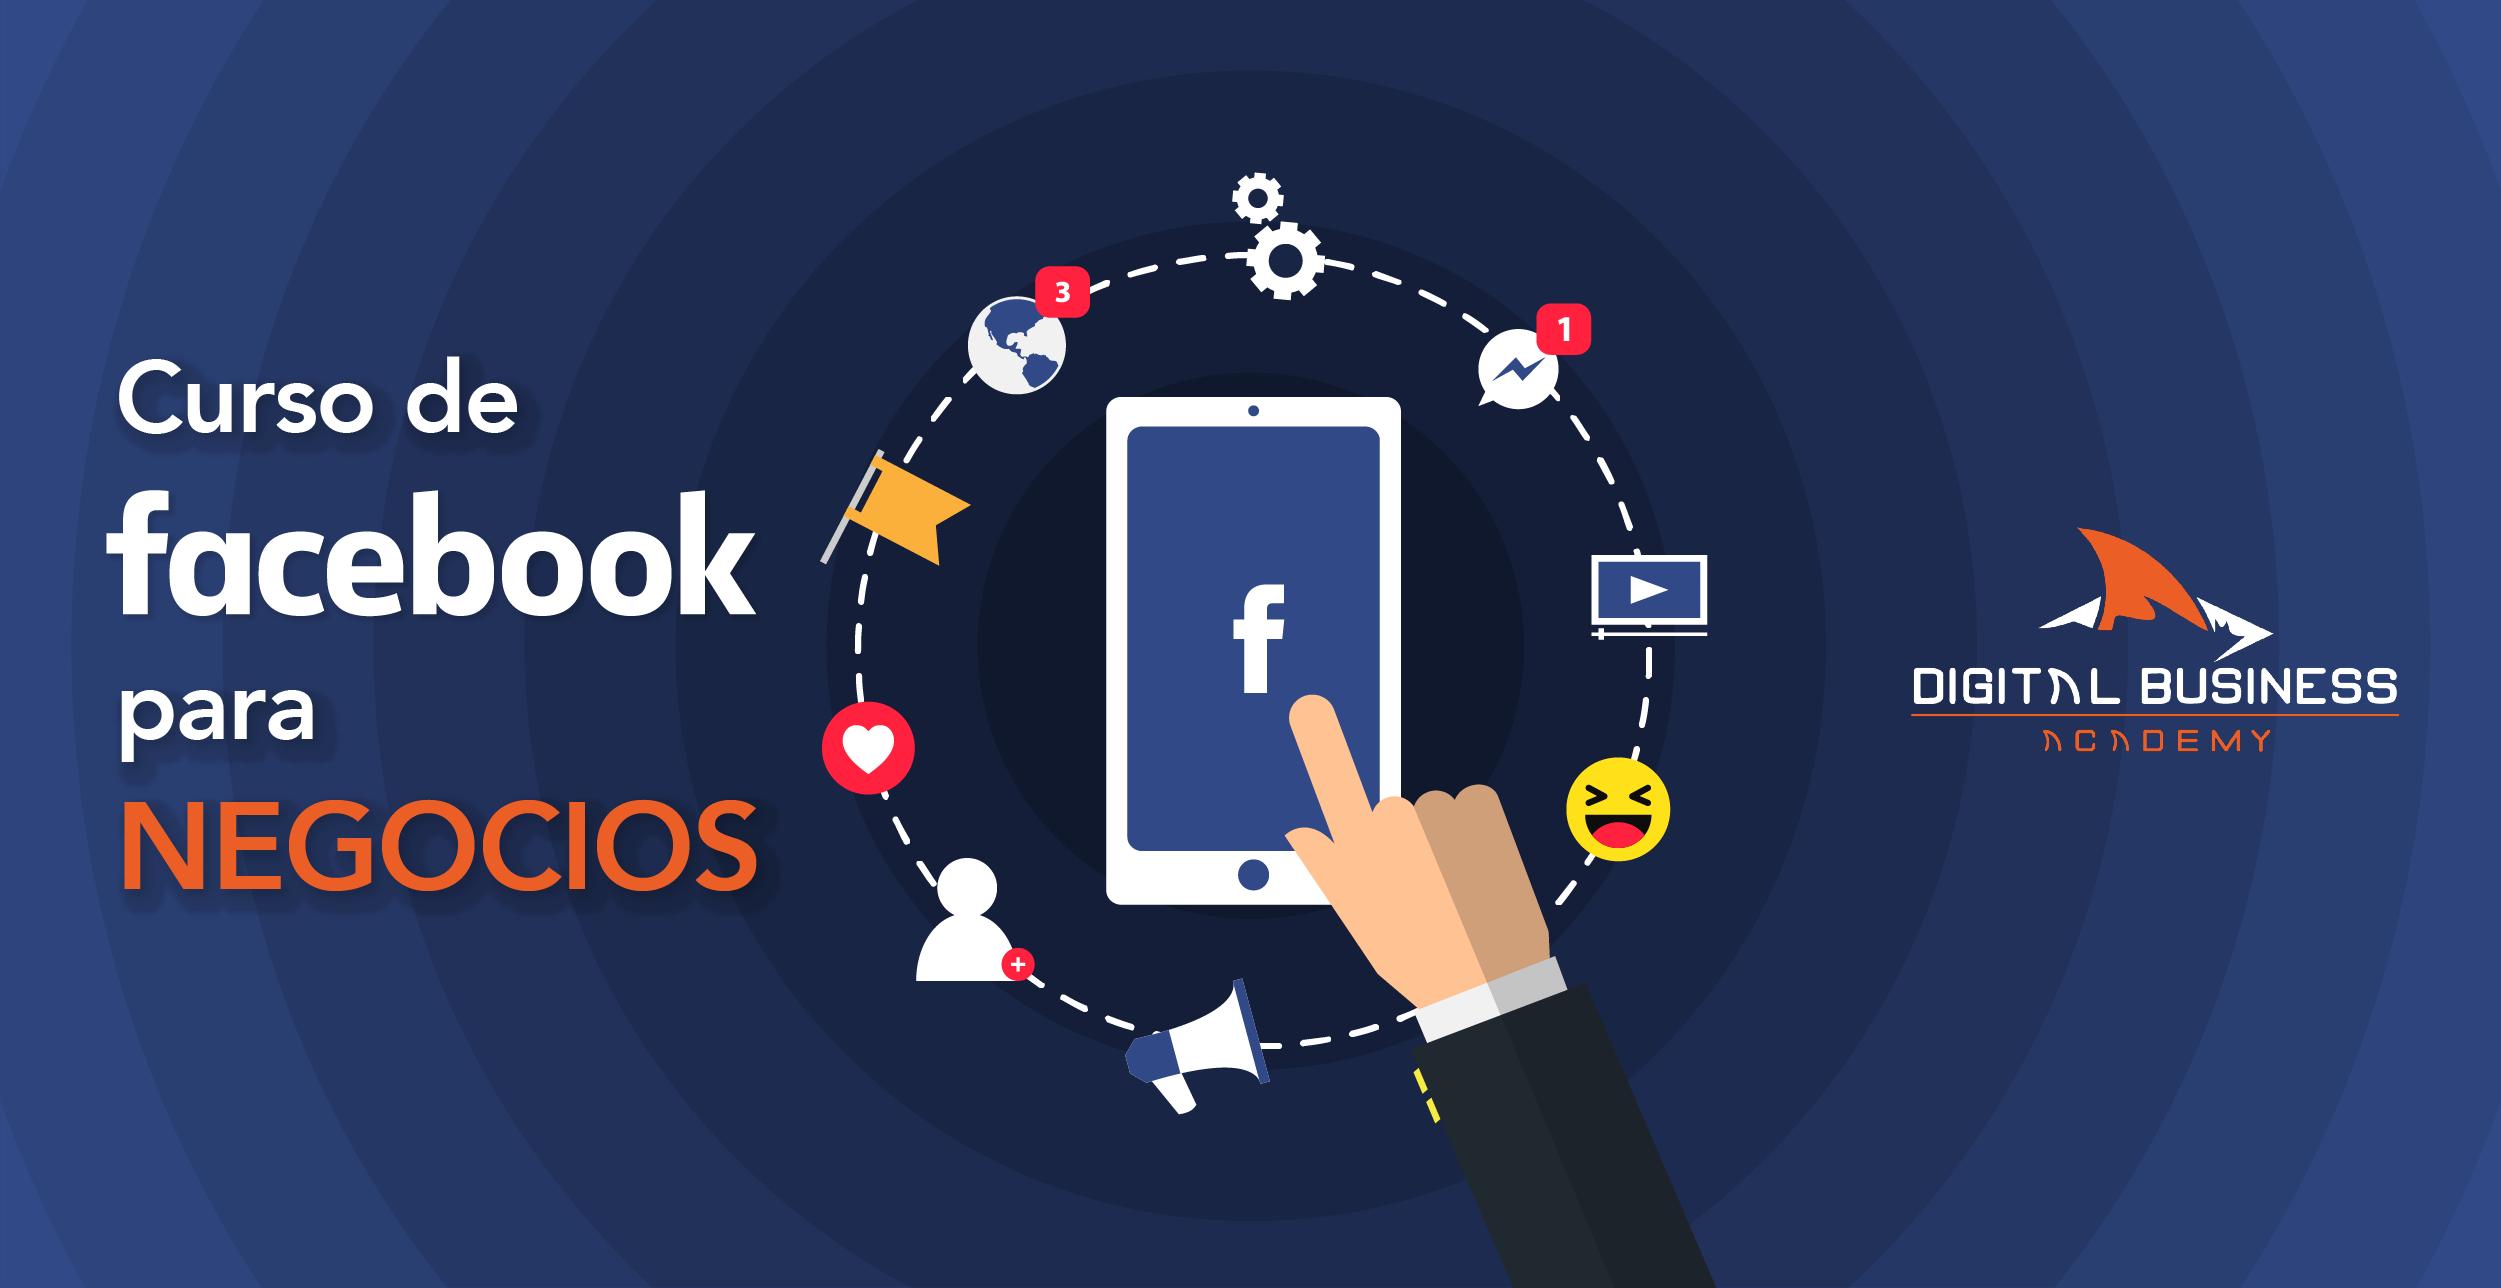 facebook para negocios 2.png